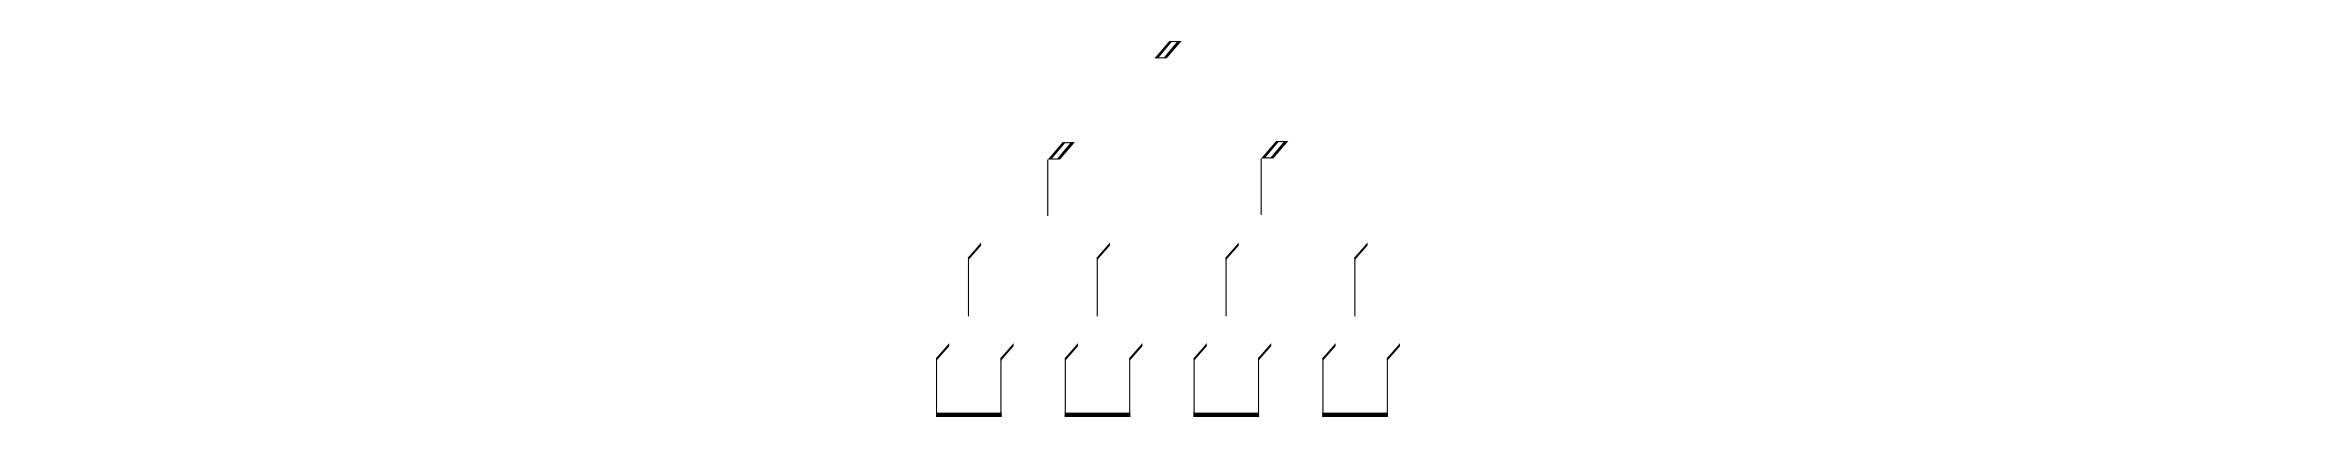 16542-what-rhythm-looks-like-insert-3